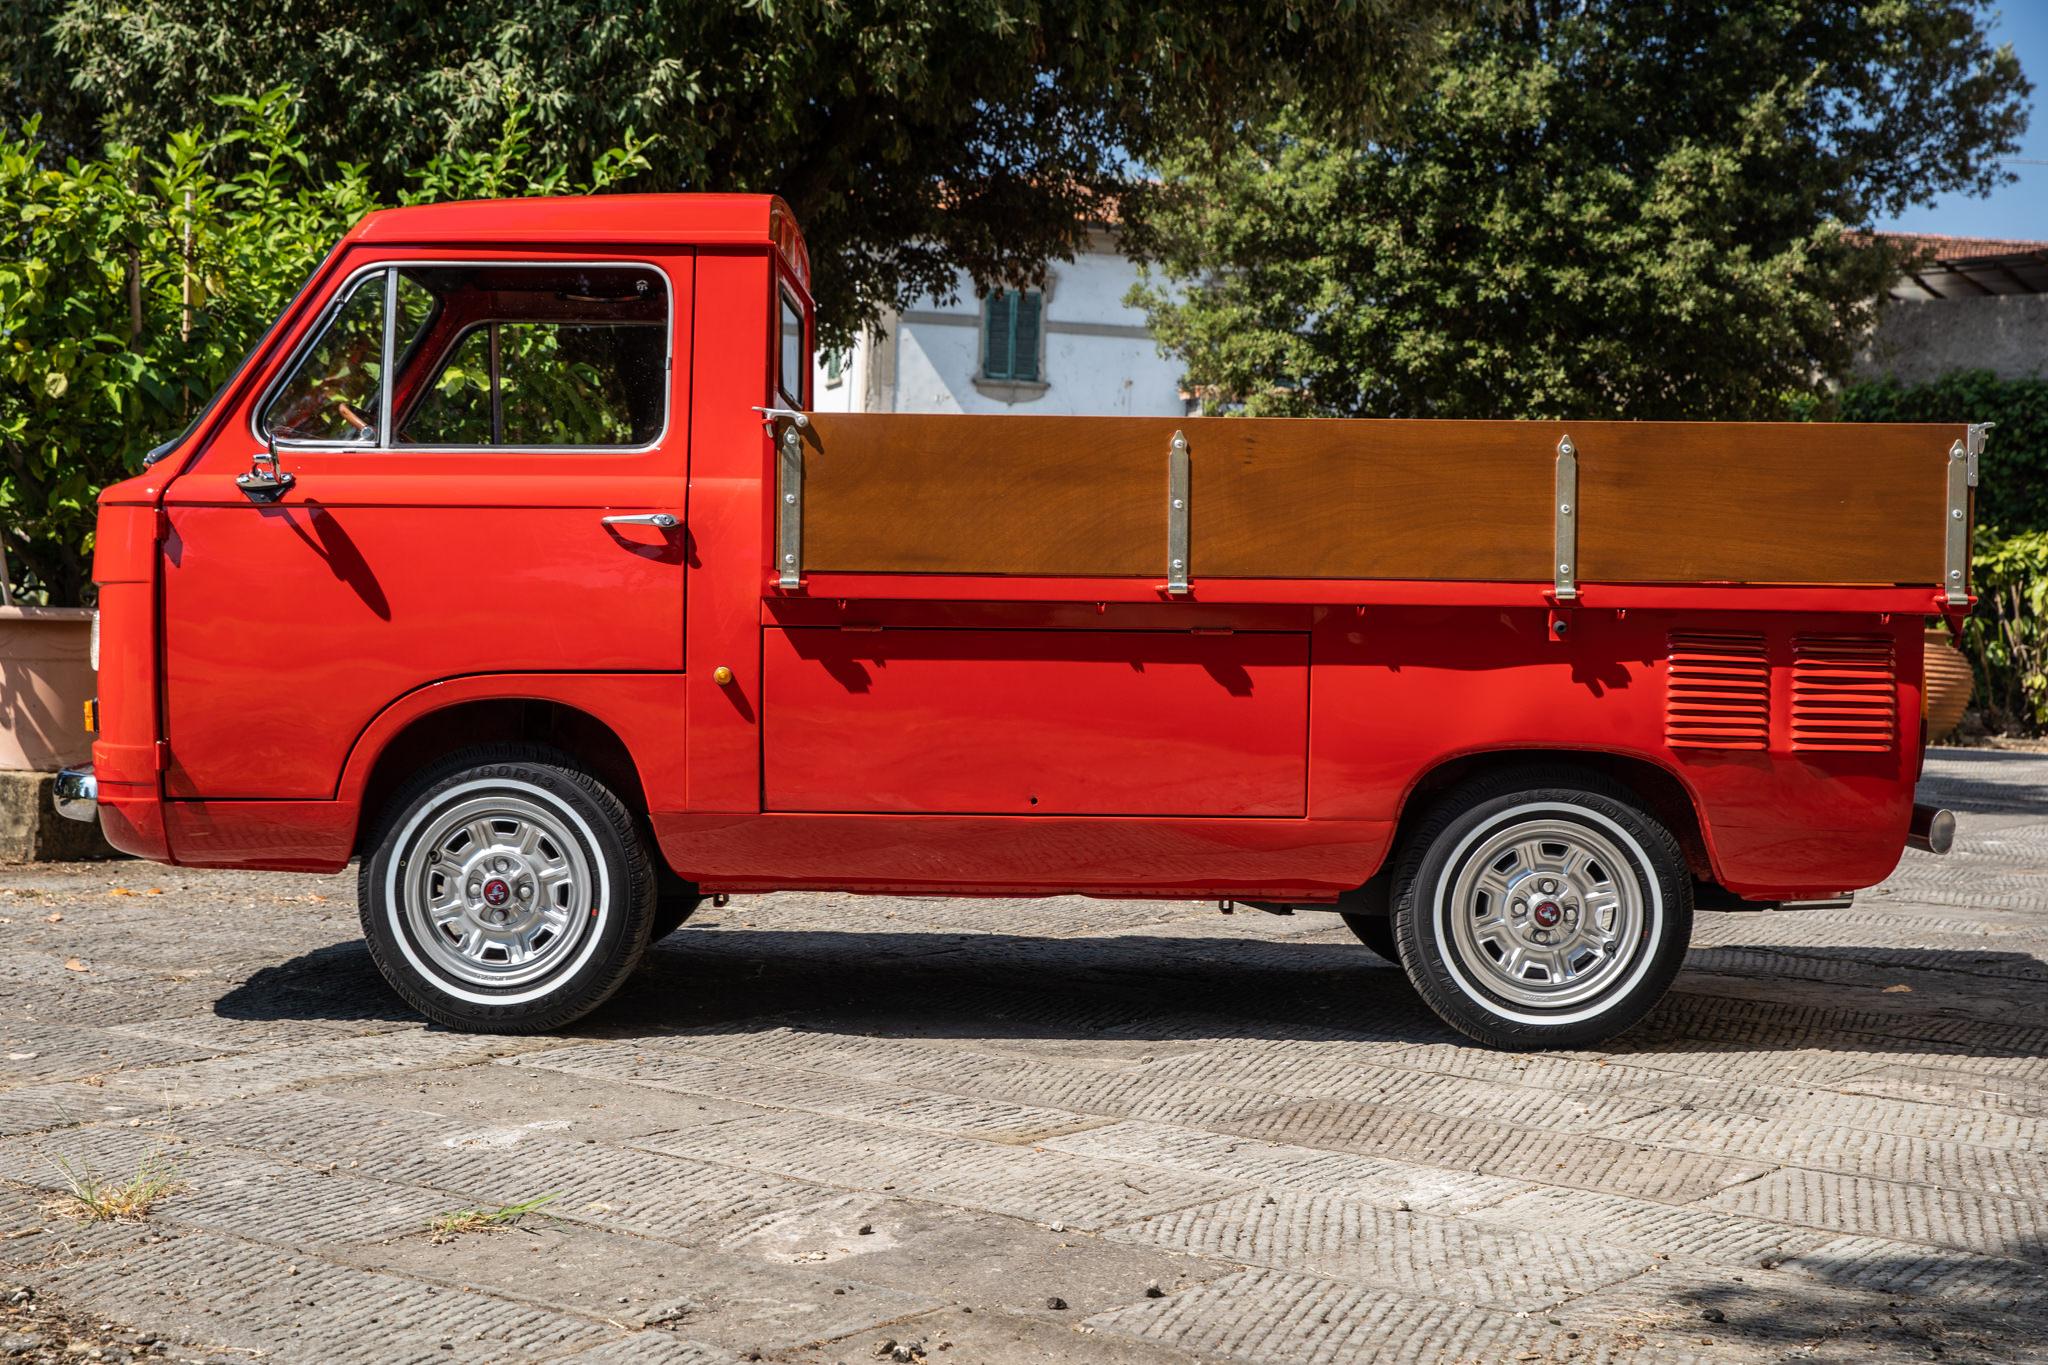 1977 Fiat 900 Coriasco Pickup Side view